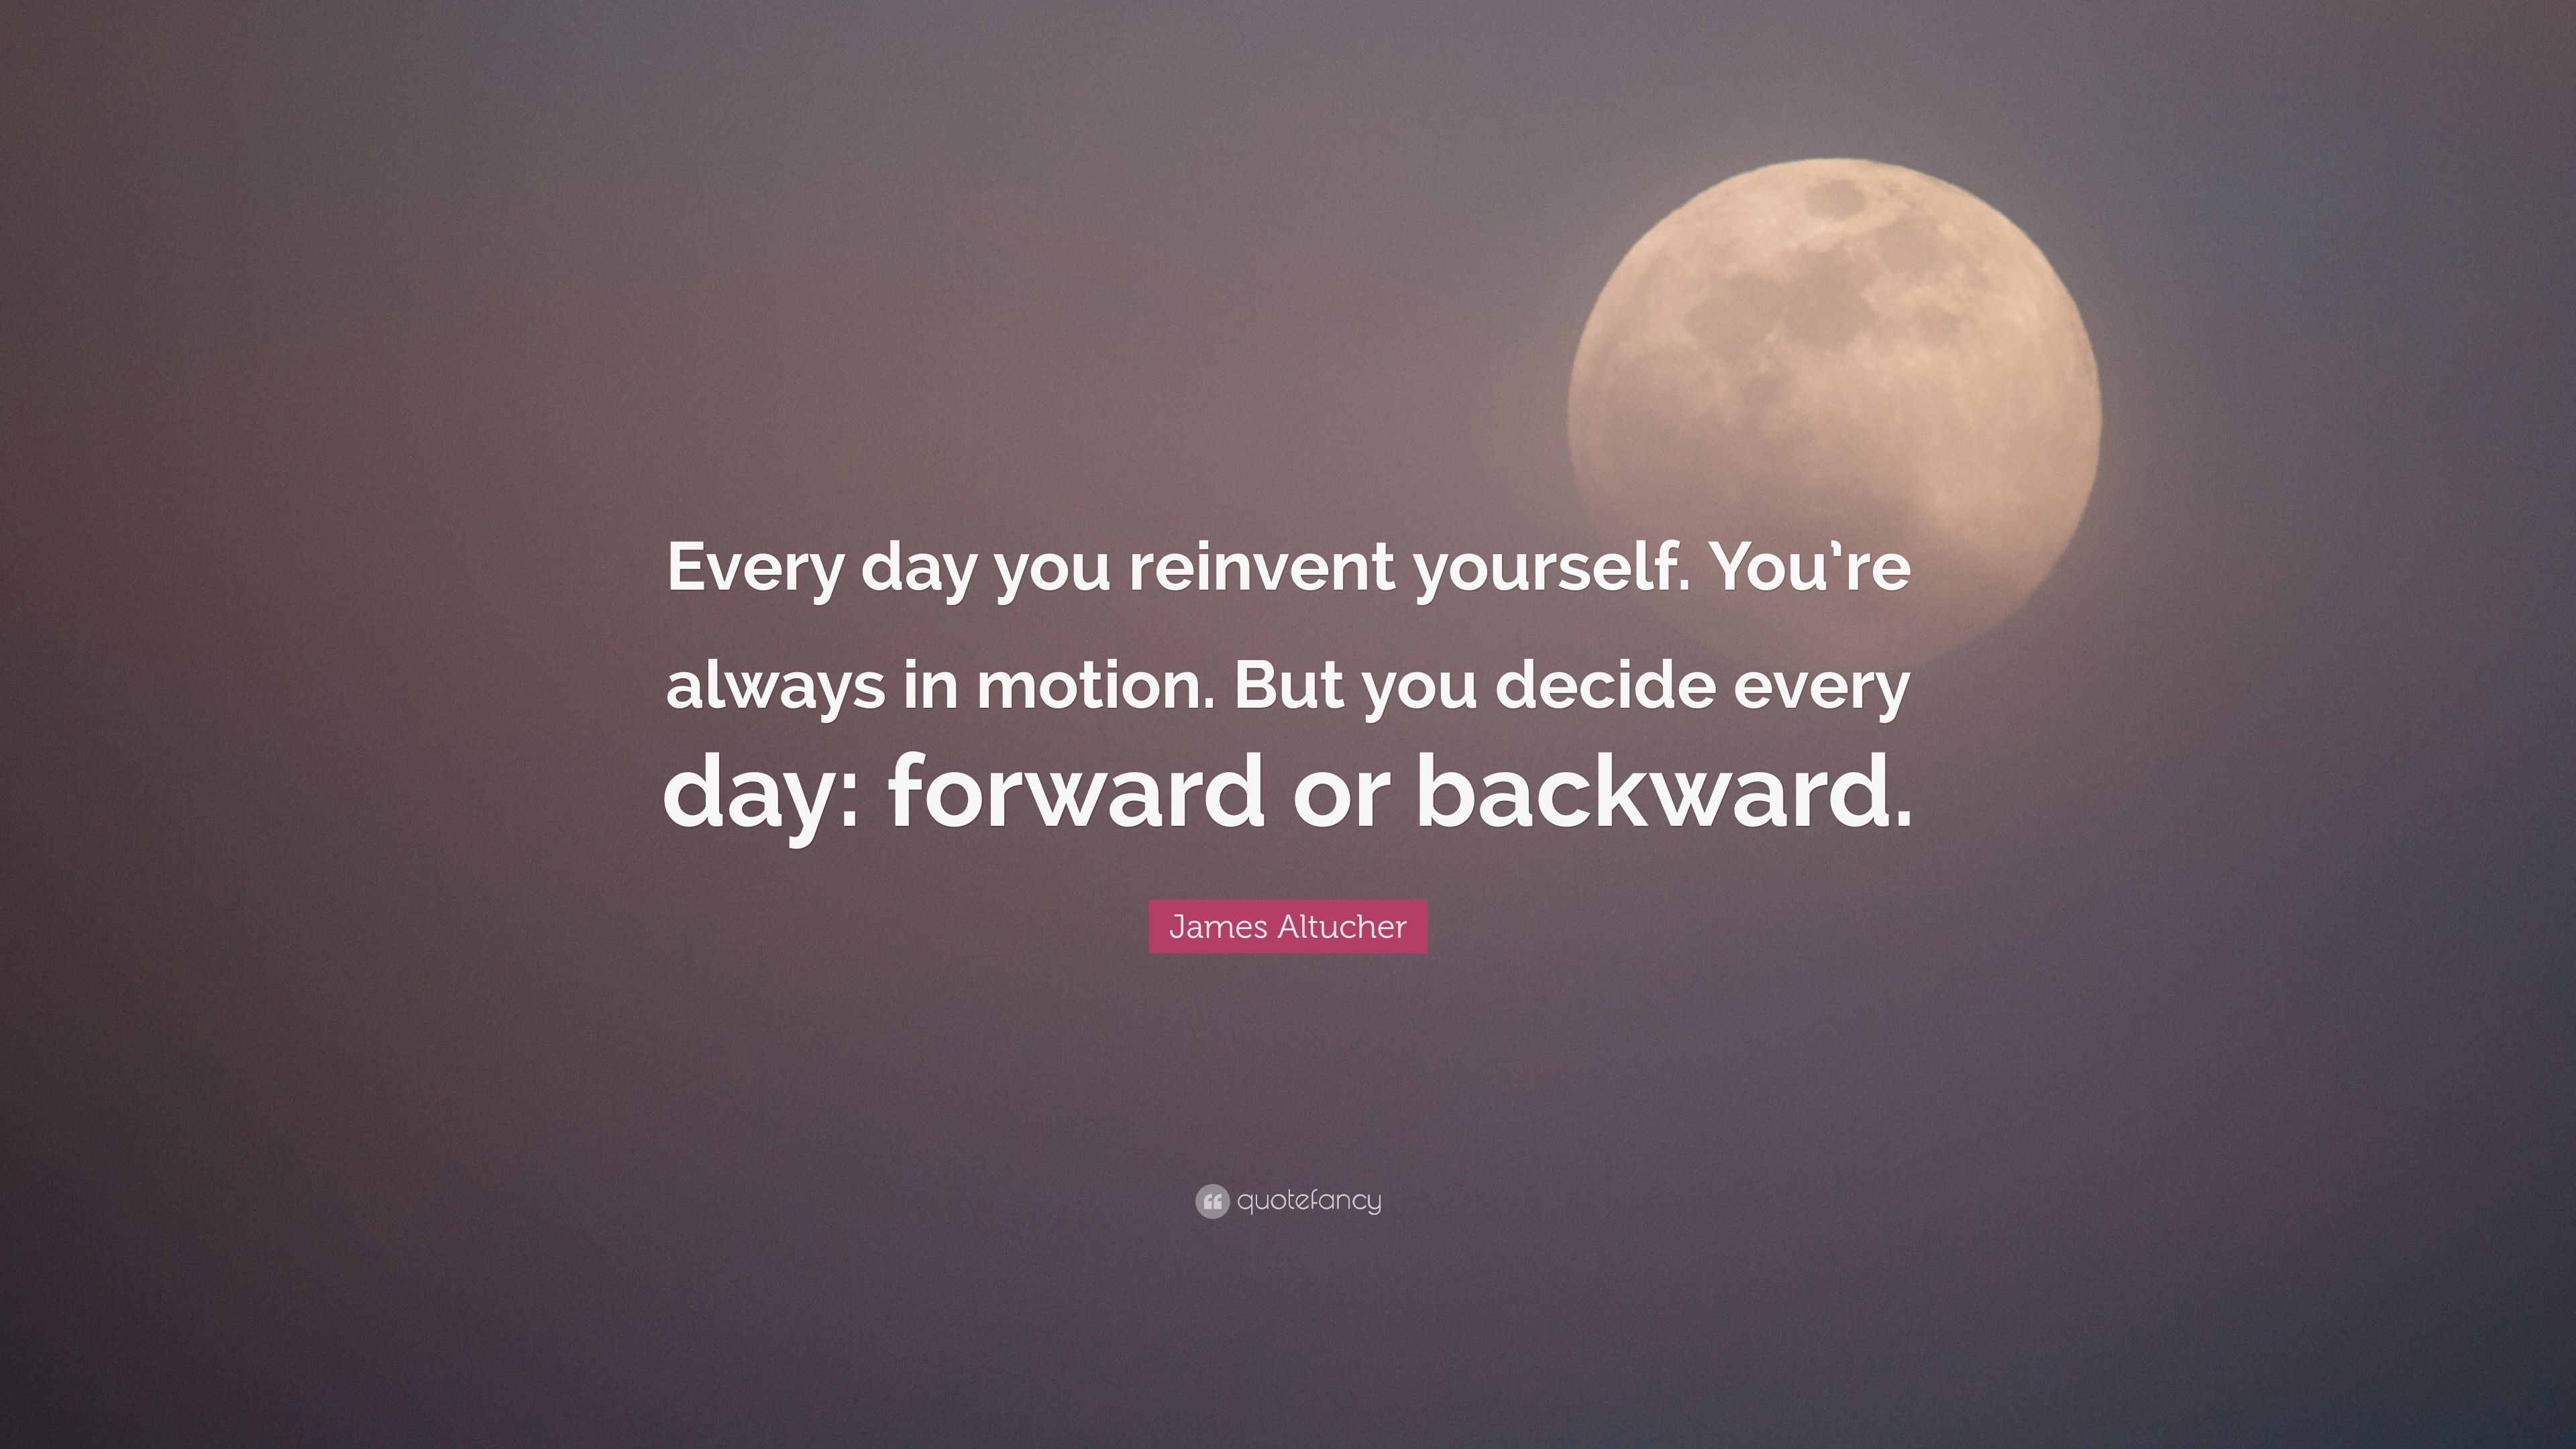 reinvent yourself james altucher